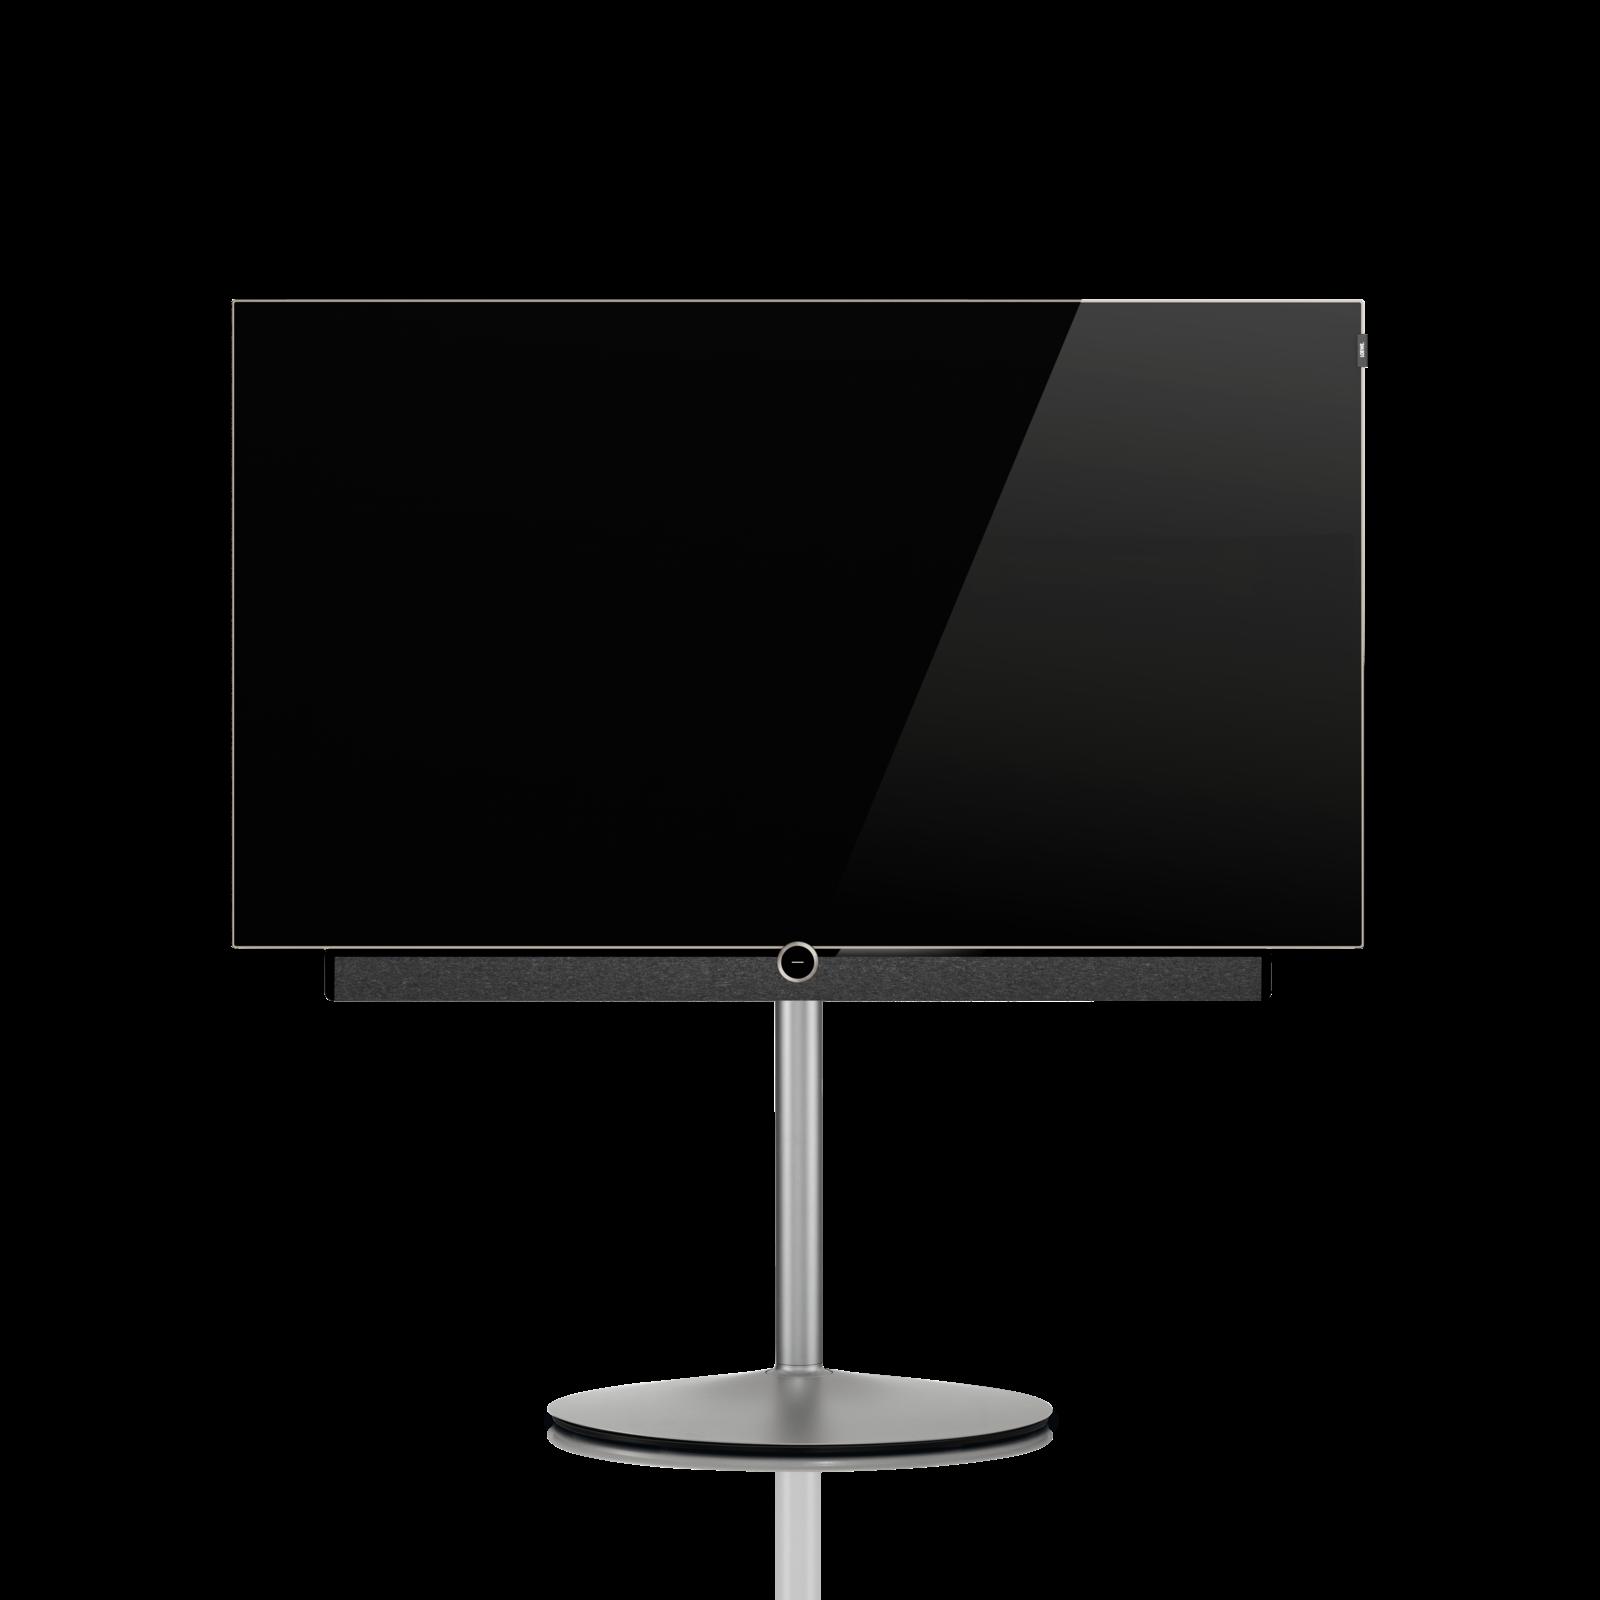 Loewe Bild 5 Oled 55 Quot 4k Smart Tv Home Media